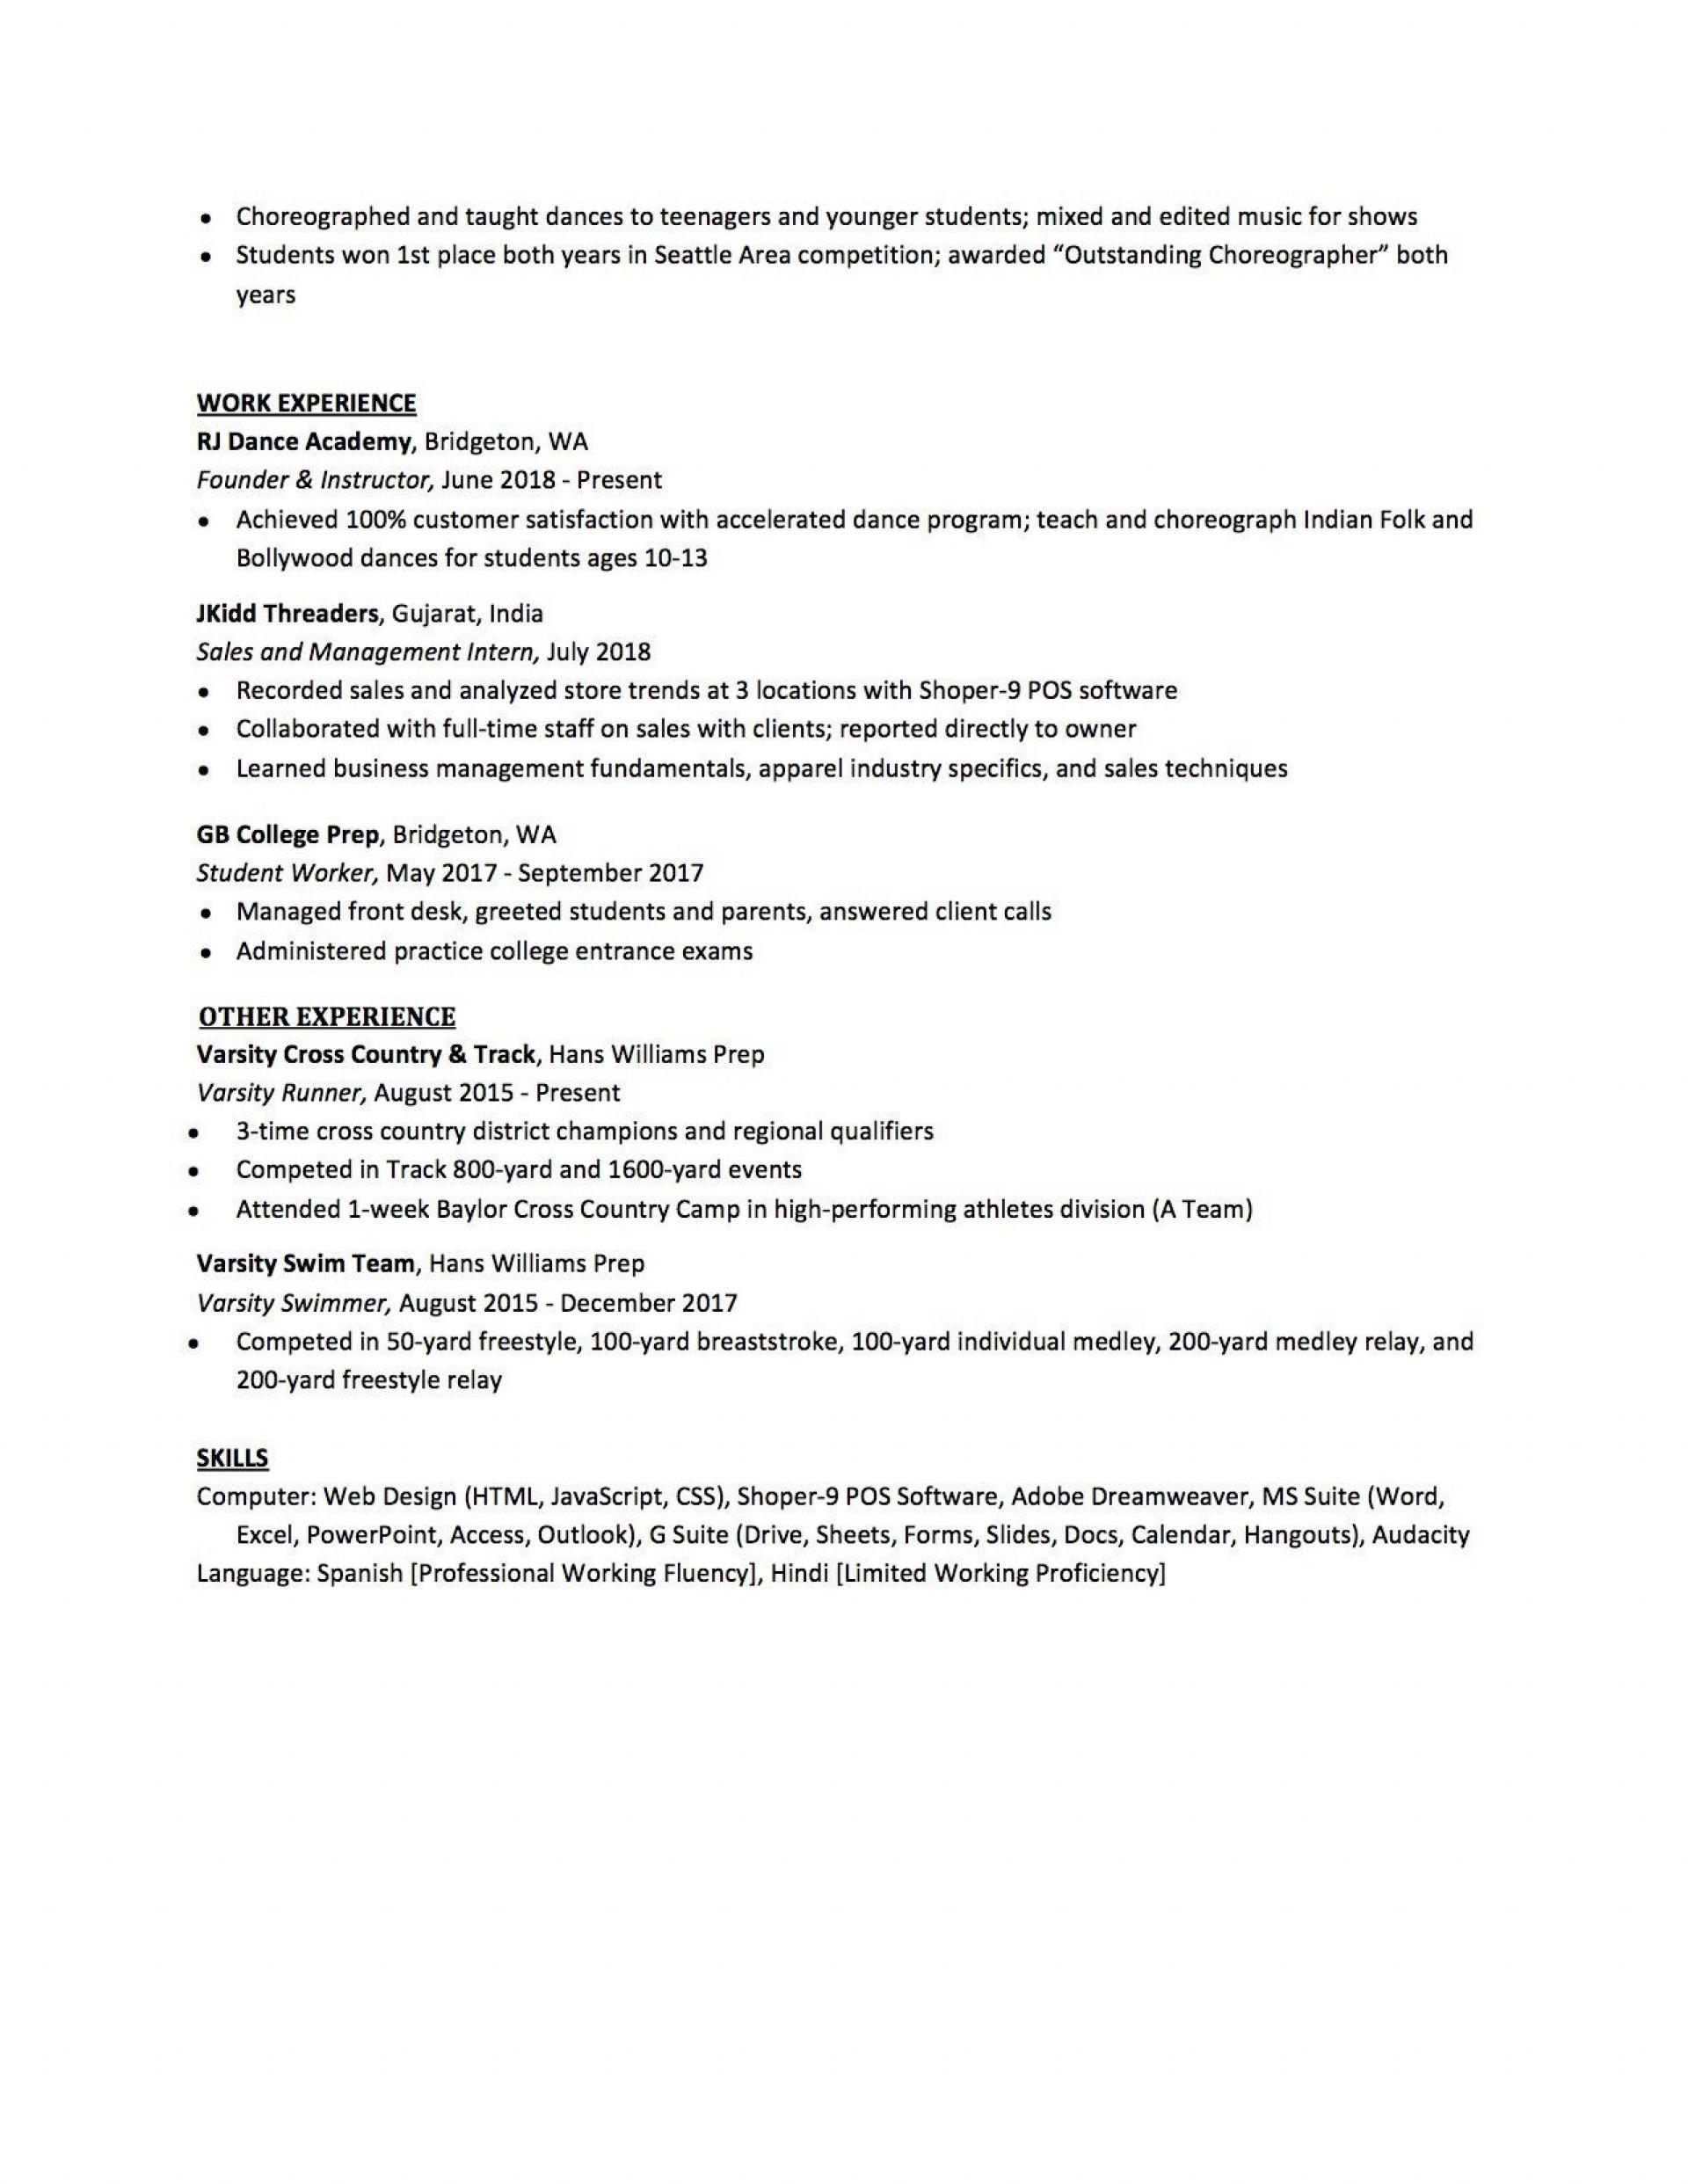 007 Sensational High School Student Resume Template Design  Free Microsoft Word 20101920